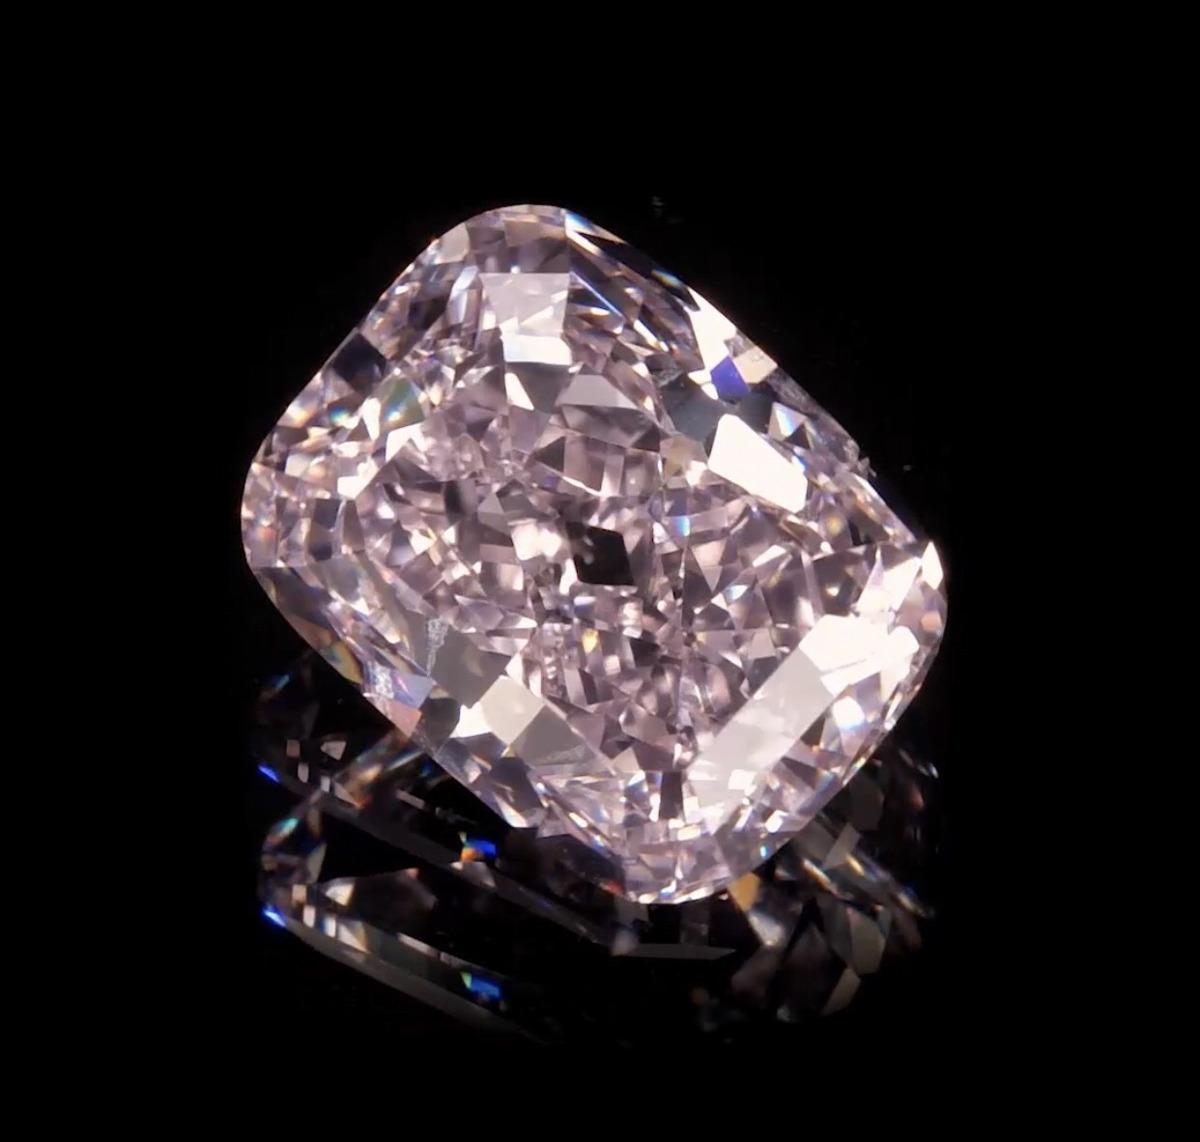 【GIA鑑定書付】8ct Fancy pink diamond VS1 ルース 裸石//